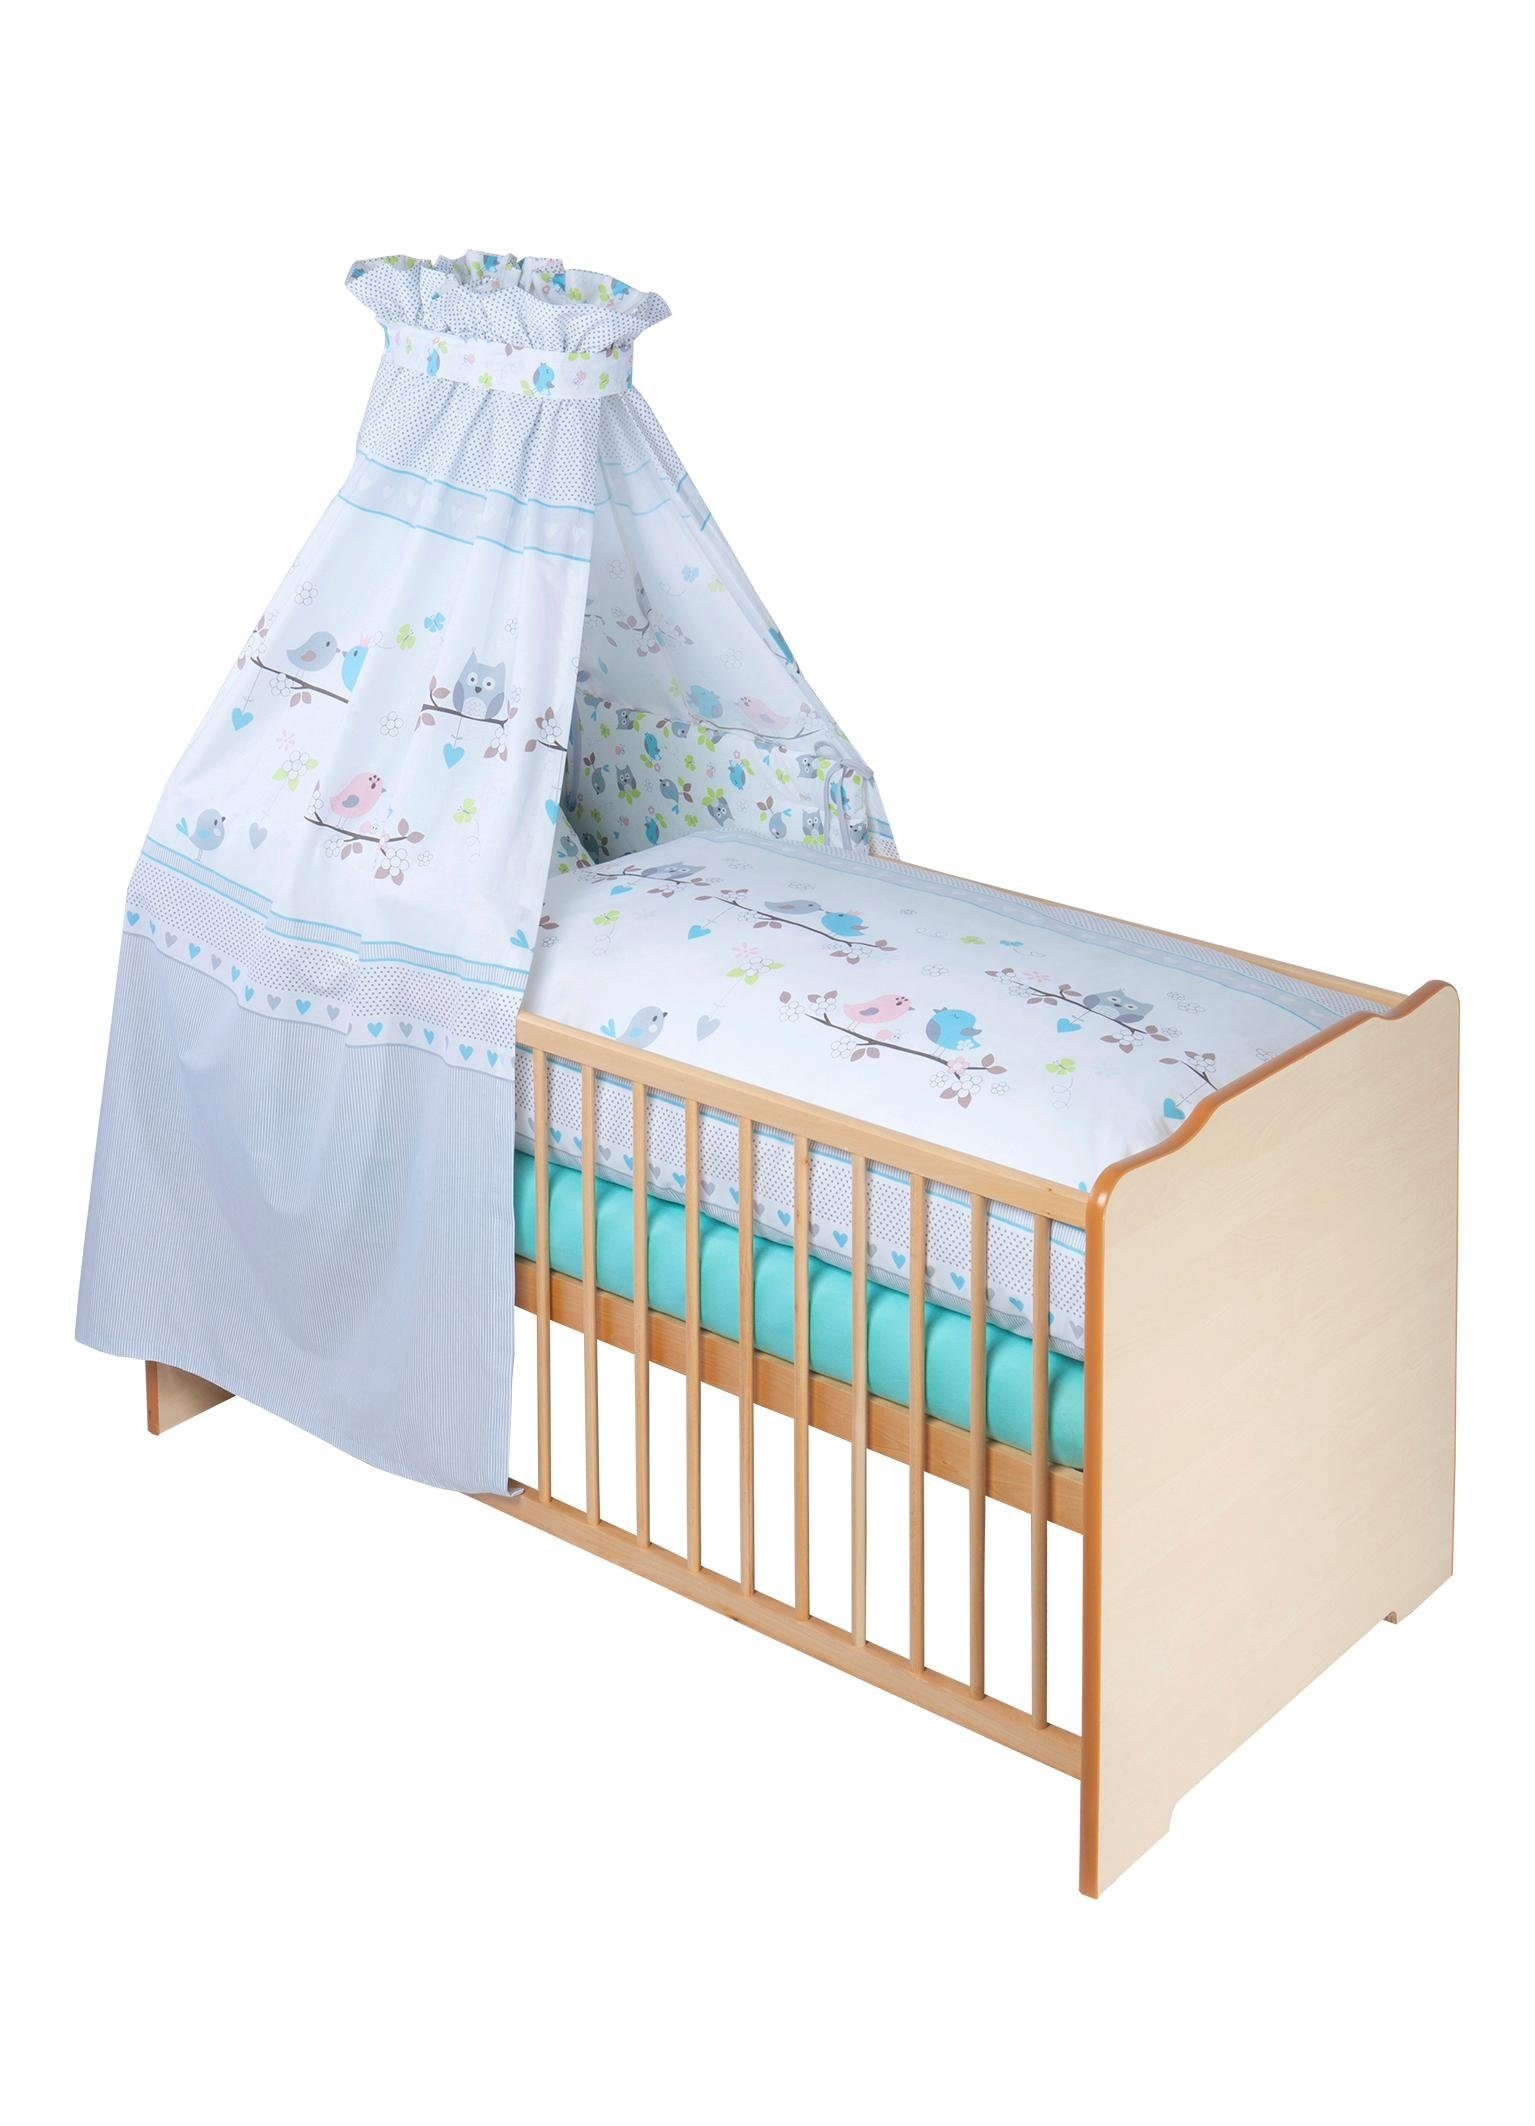 Zöllner 7-tlg. Komplettbett »Vögel«, Babybett+ Matratze+ Himmelstange+ Himmel+ Nestchen+ Bettwäsche